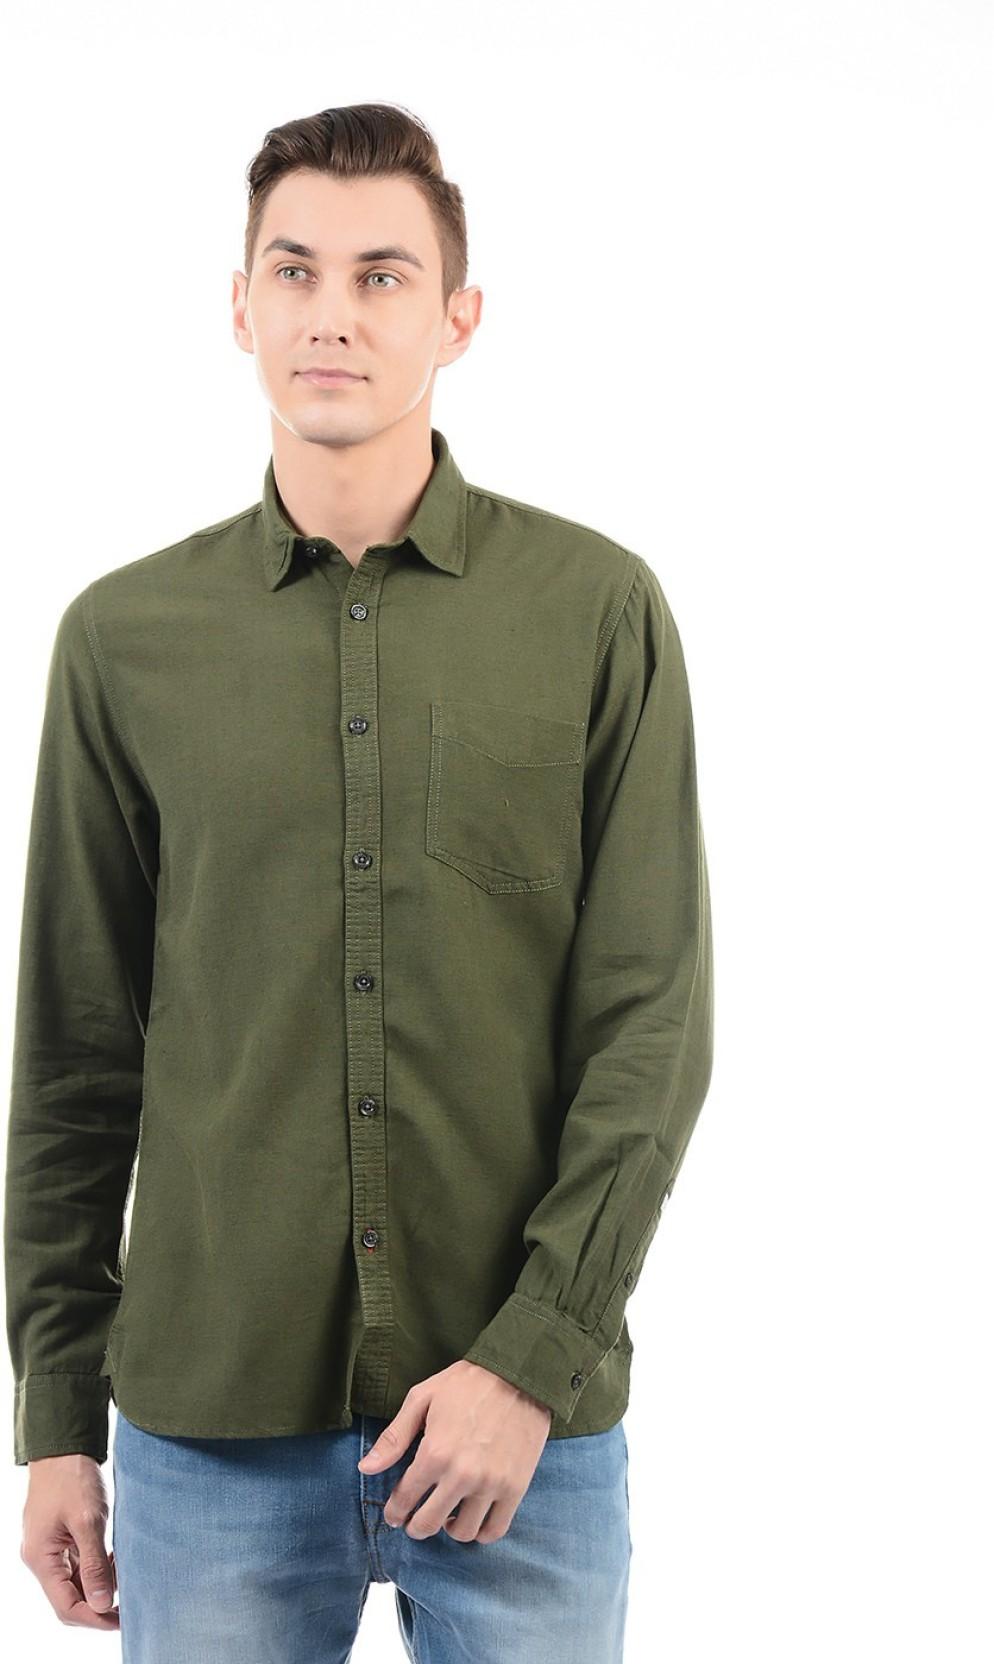 21987c98546f7 Pepe Jeans Green Shirt